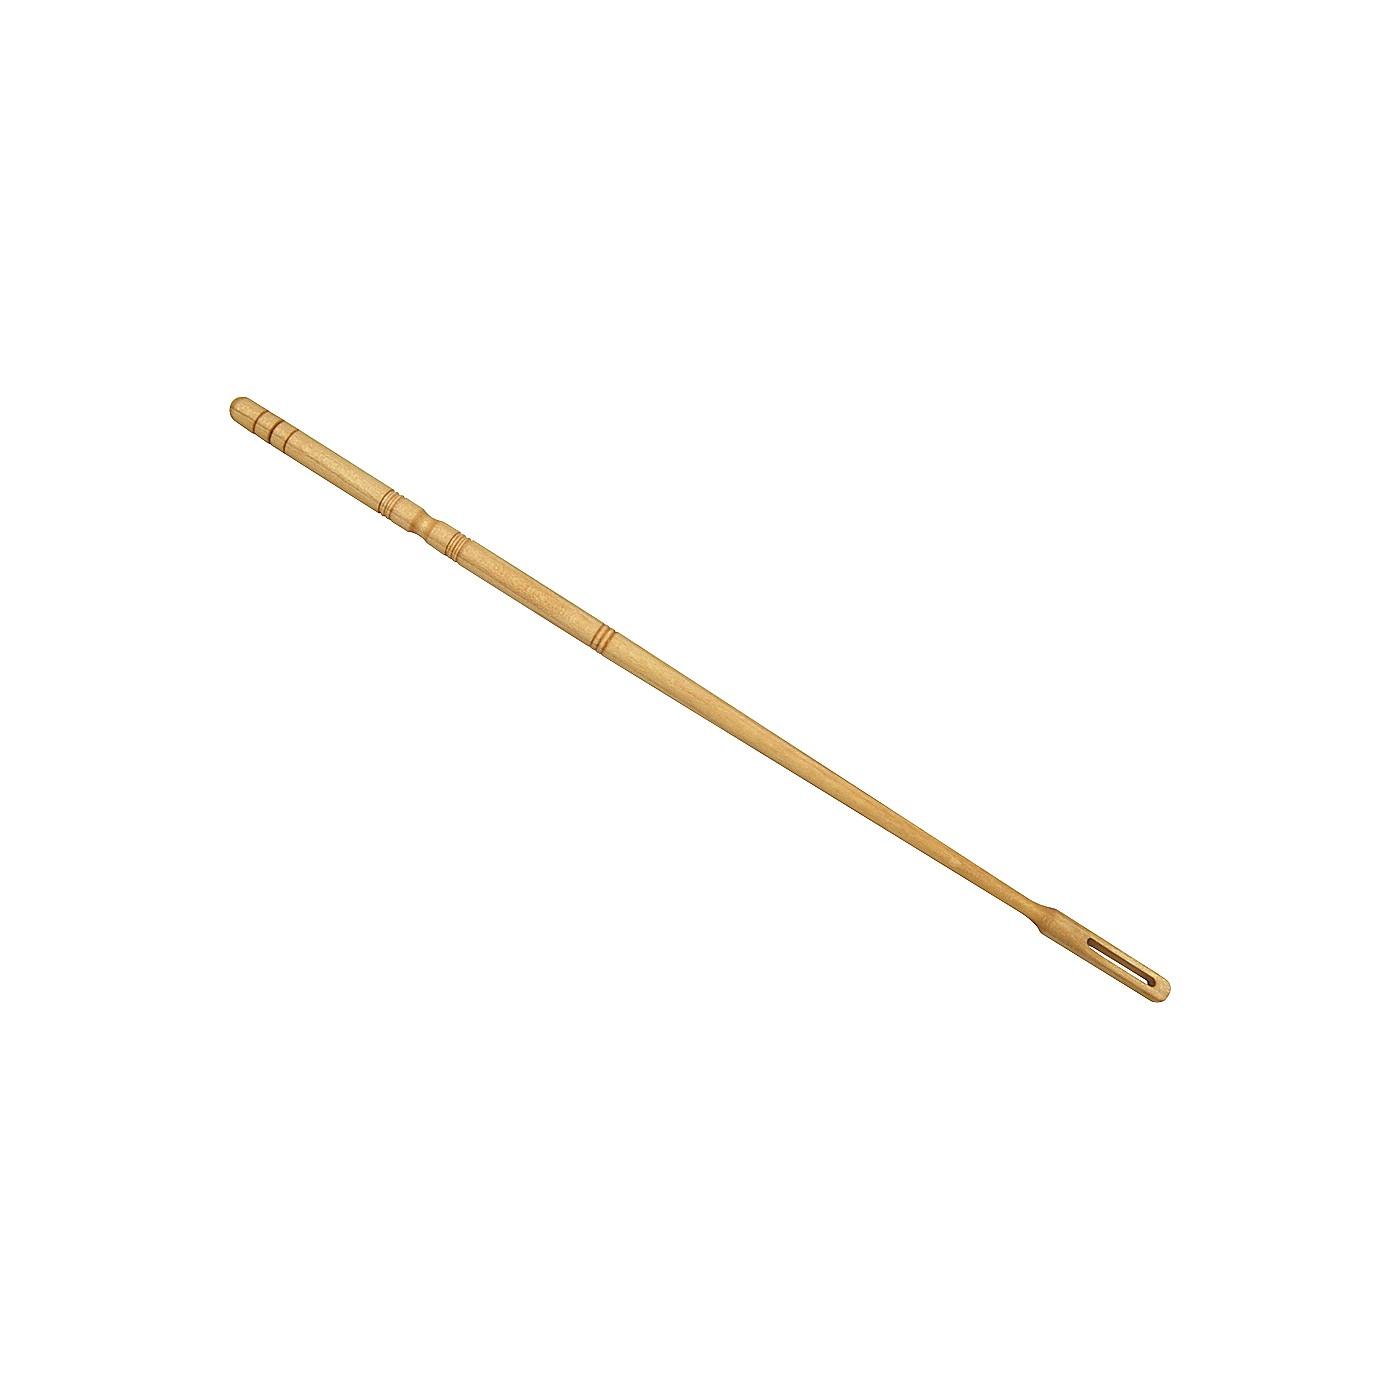 Yamaha Wooden Flute Cleaning Rod thumbnail